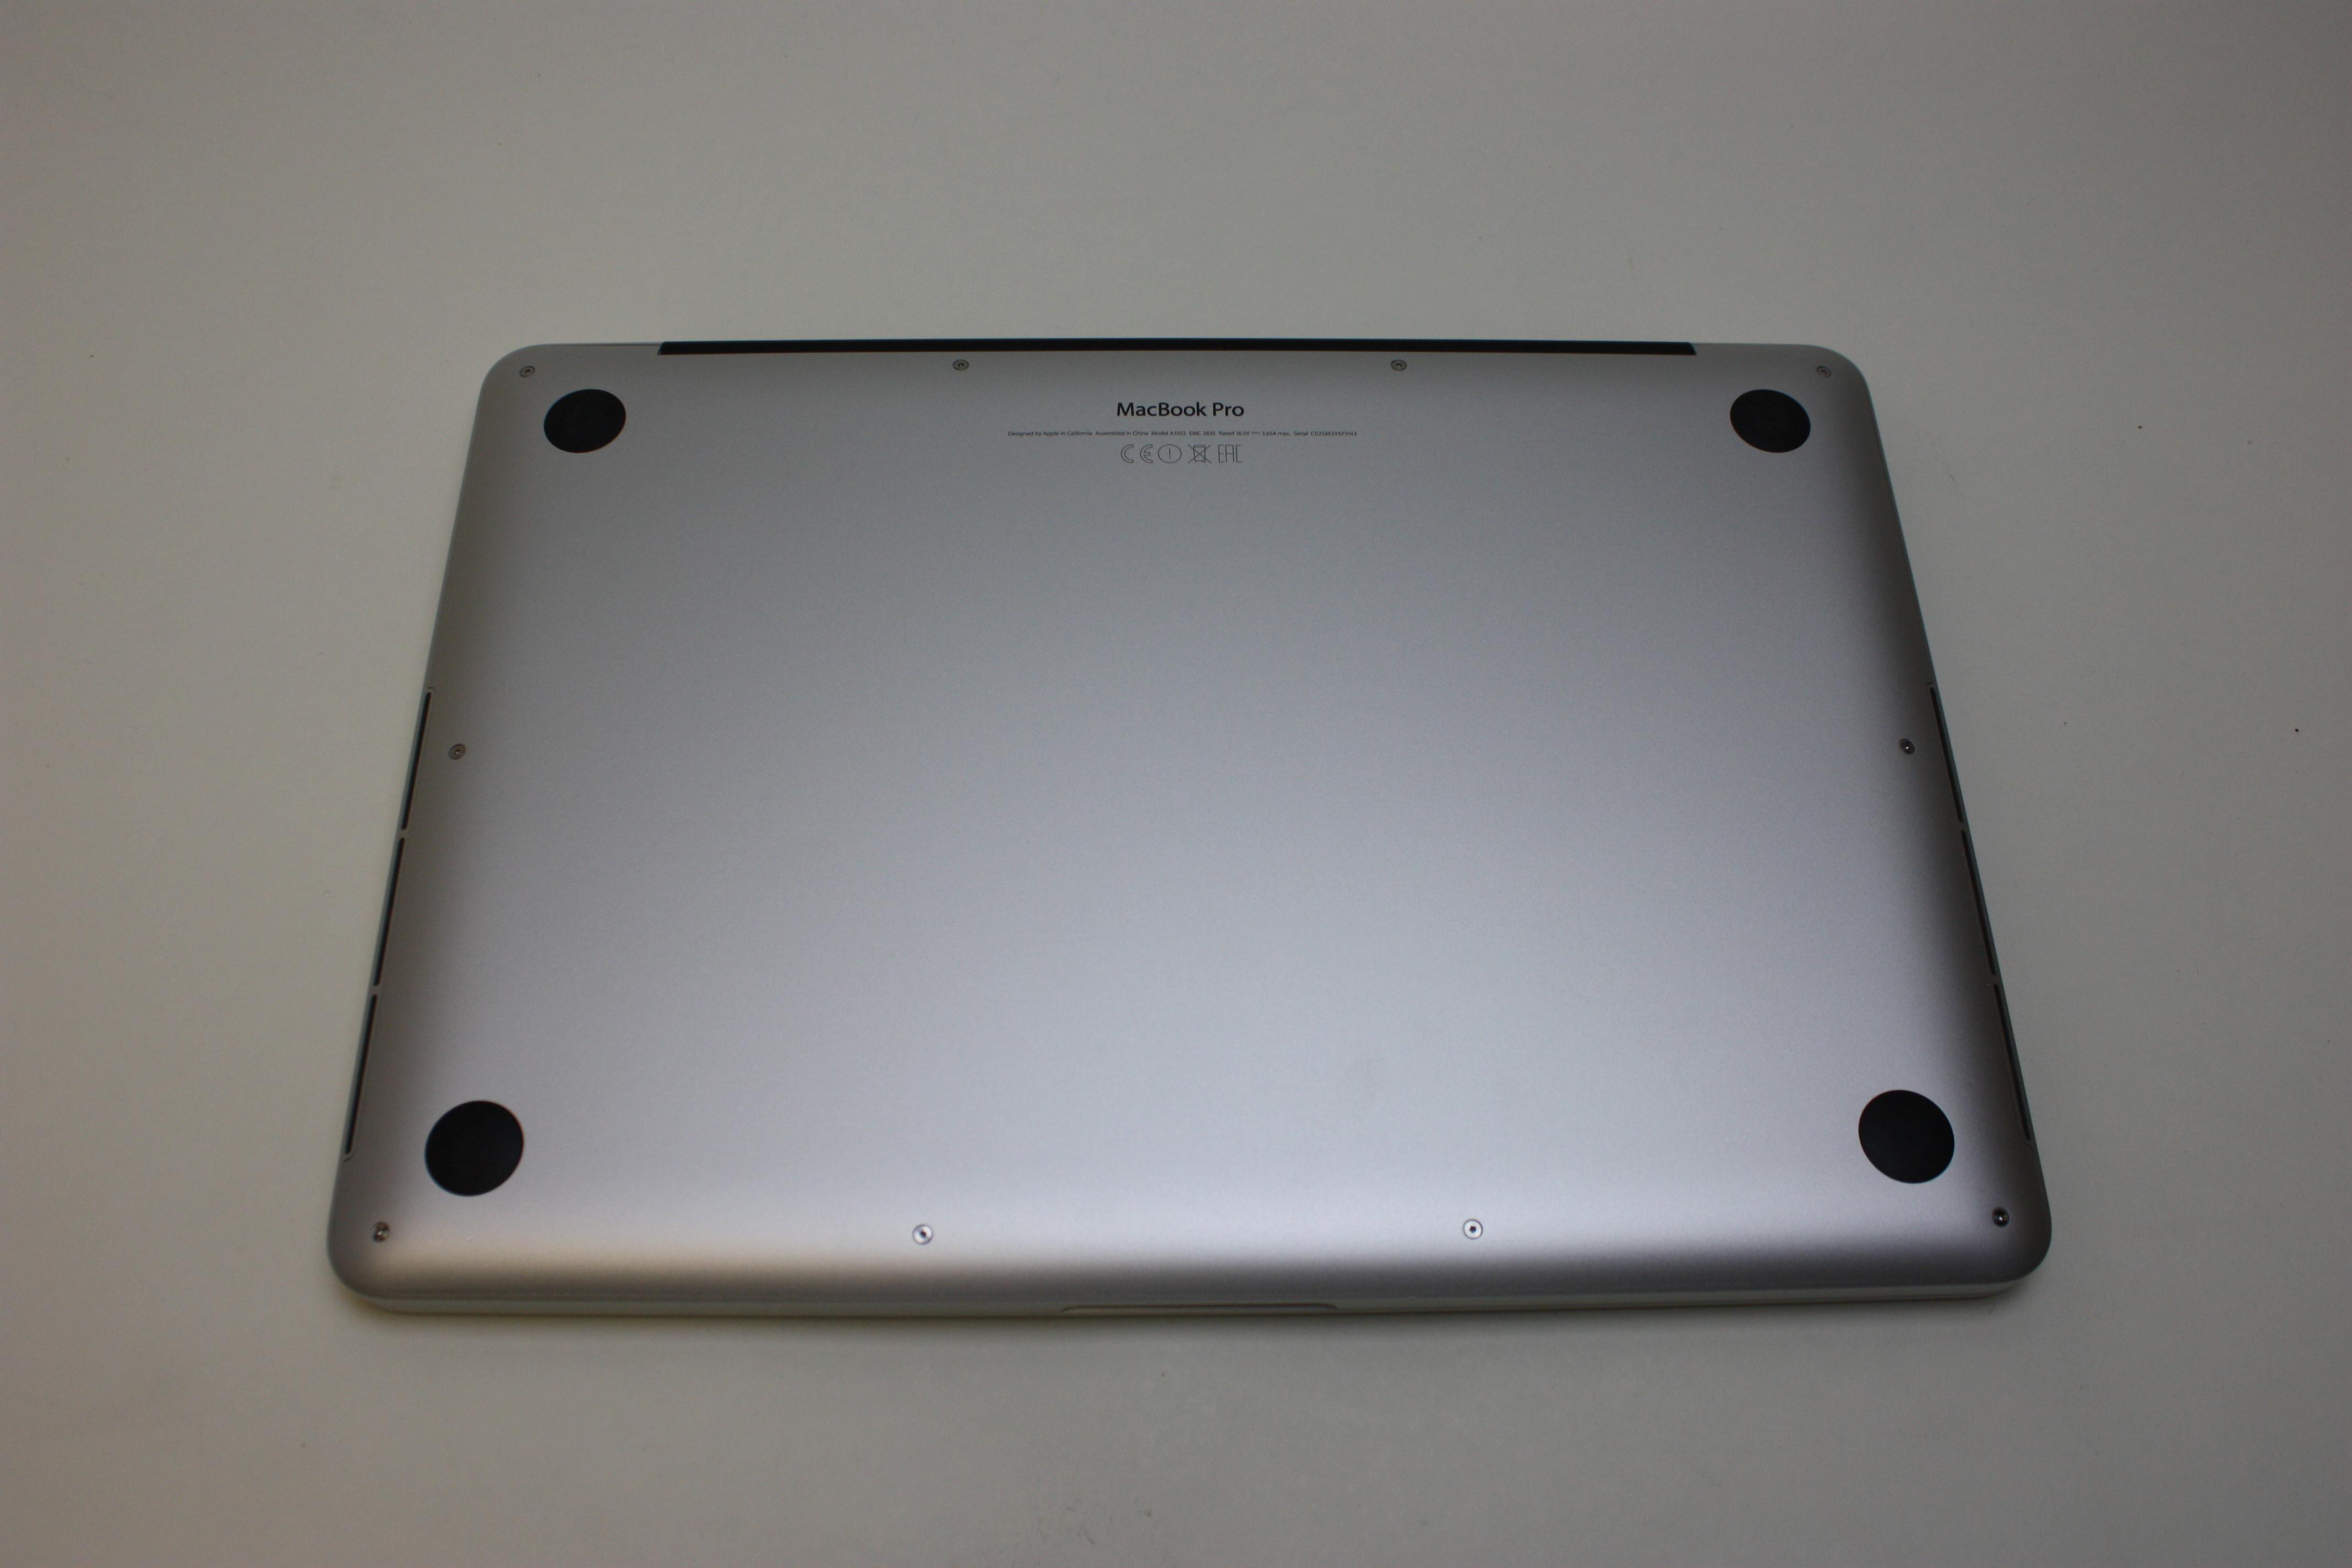 MacBook Pro 13-inch Retina, 2.7 GHz Core i5 (I5-5257U), 8 GB 1867 MHz DDR3, 128 GB Flash Storage, image 8